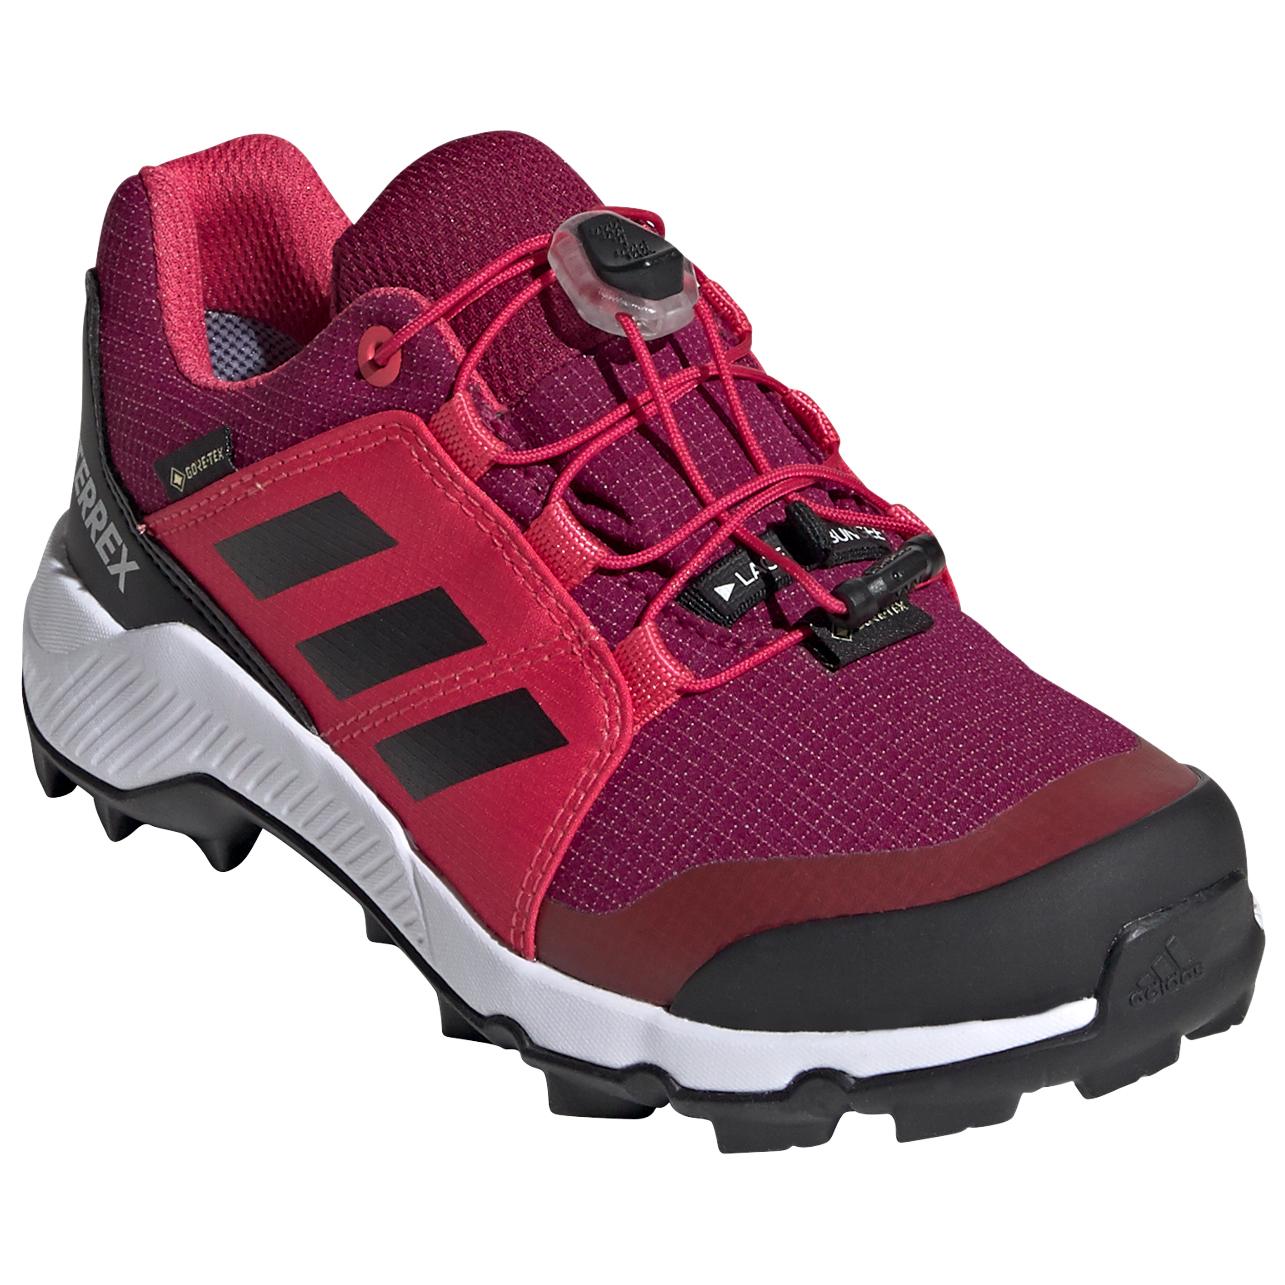 Adidas Terrex GTX - Multisport shoes